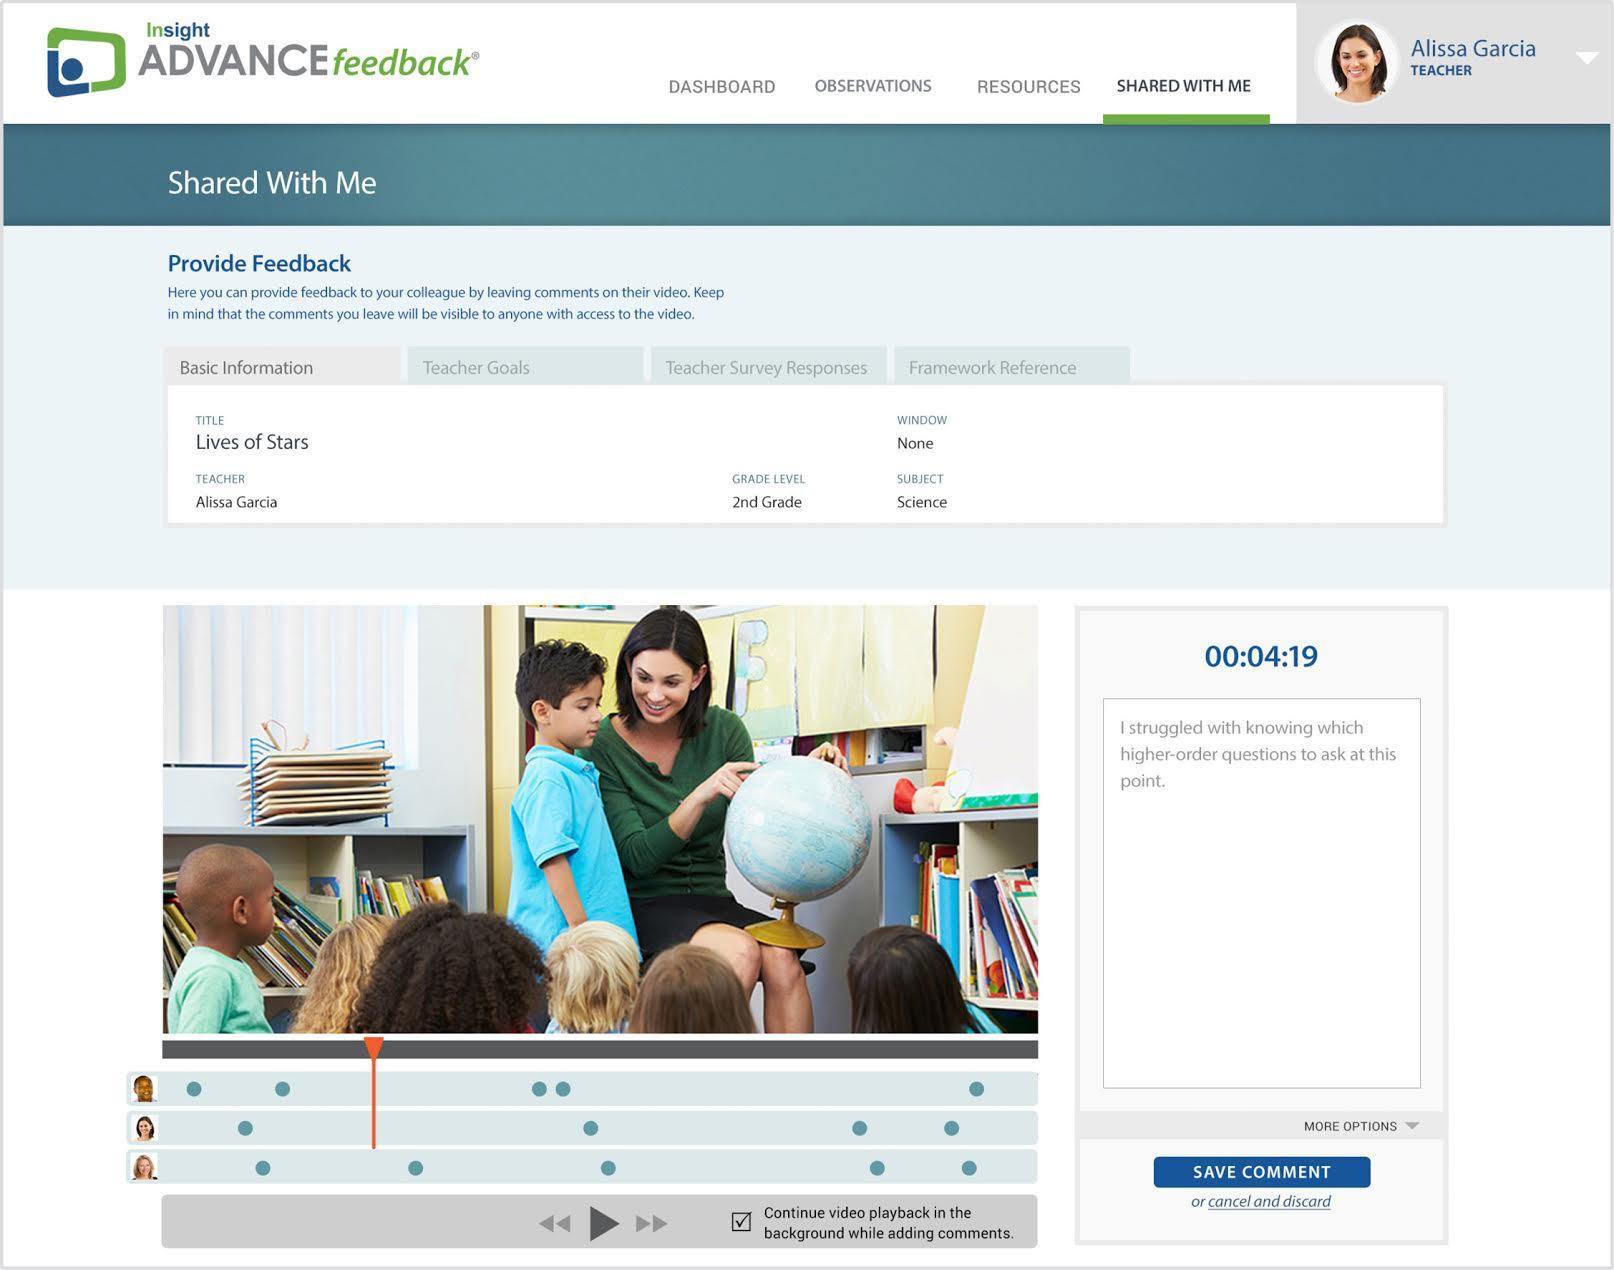 Professional Development - ADVANCEfeedback